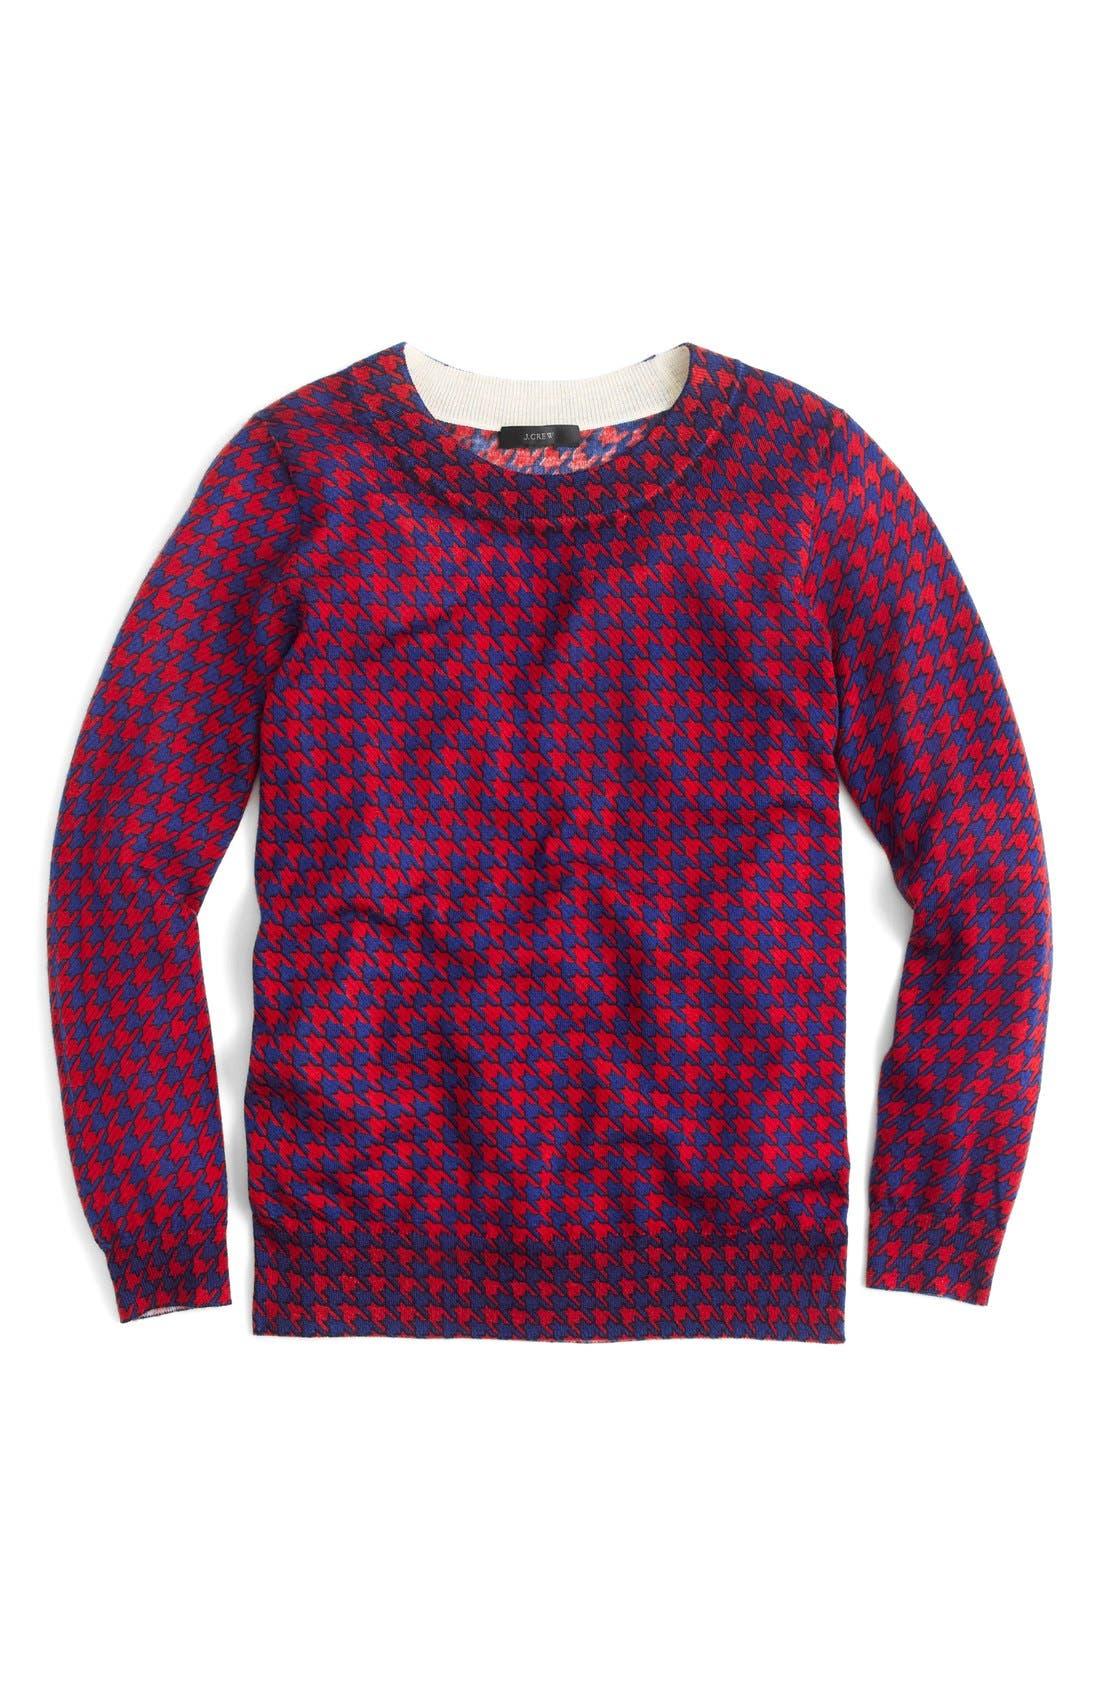 Alternate Image 3  - J.Crew Tippi Houndstooth Sweater